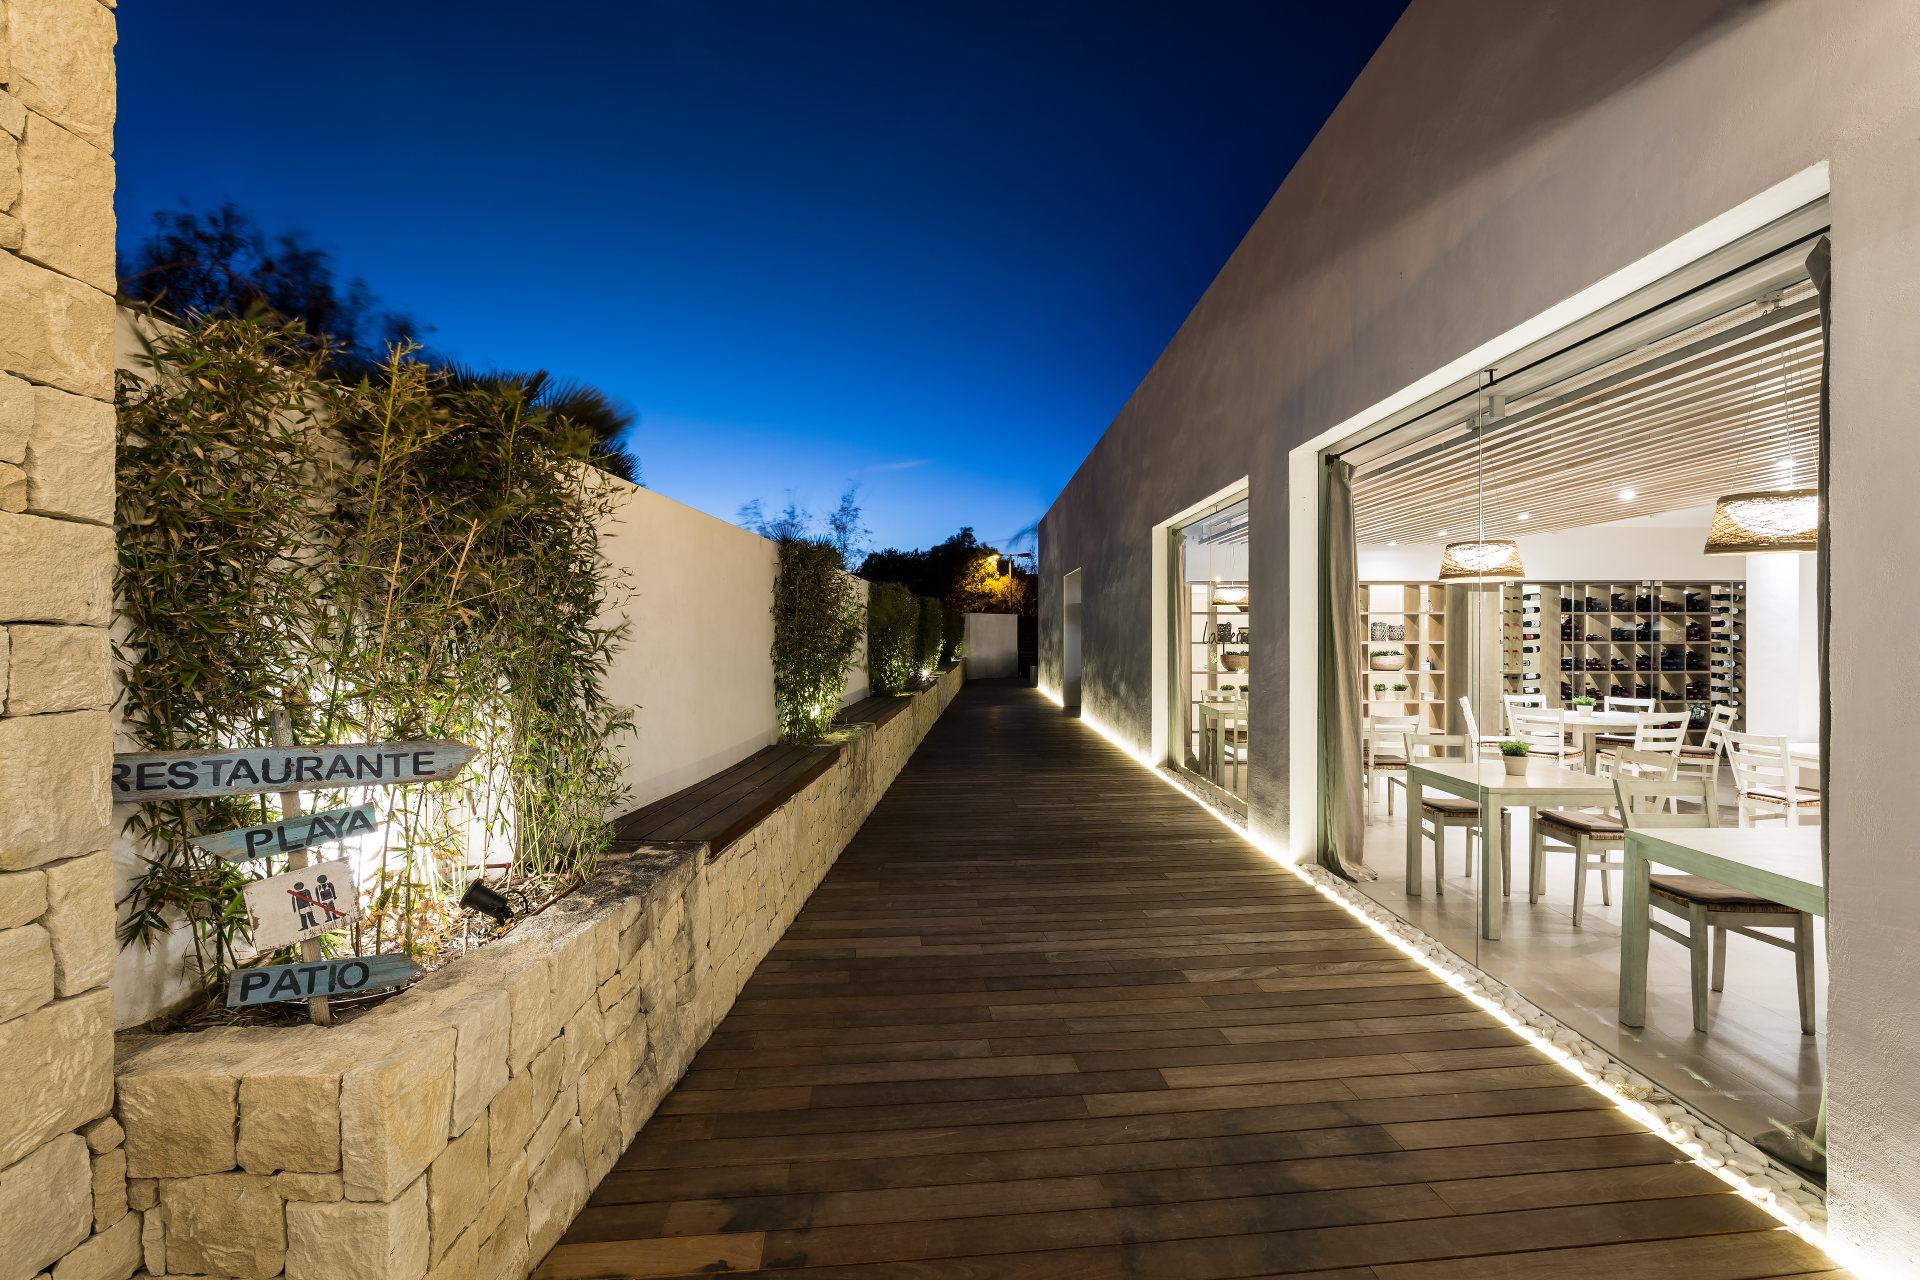 fotografia-arquitectura-valencia-german-cabo-versea-restaurante-ferrera-pinedo (28)